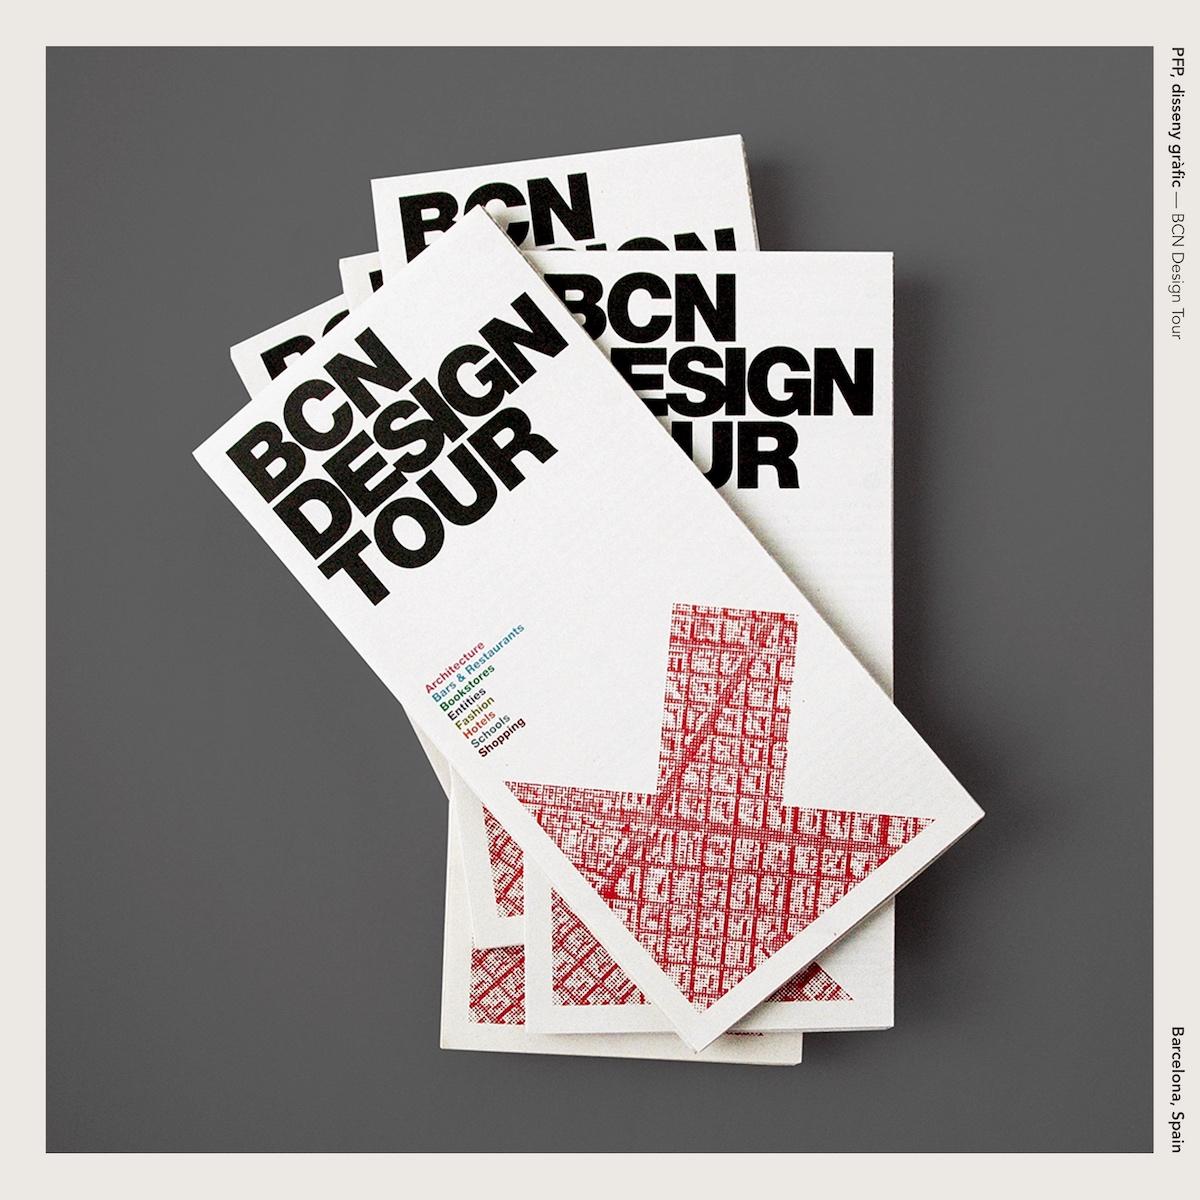 PFP, disseny gràfic —BCN Design Tour